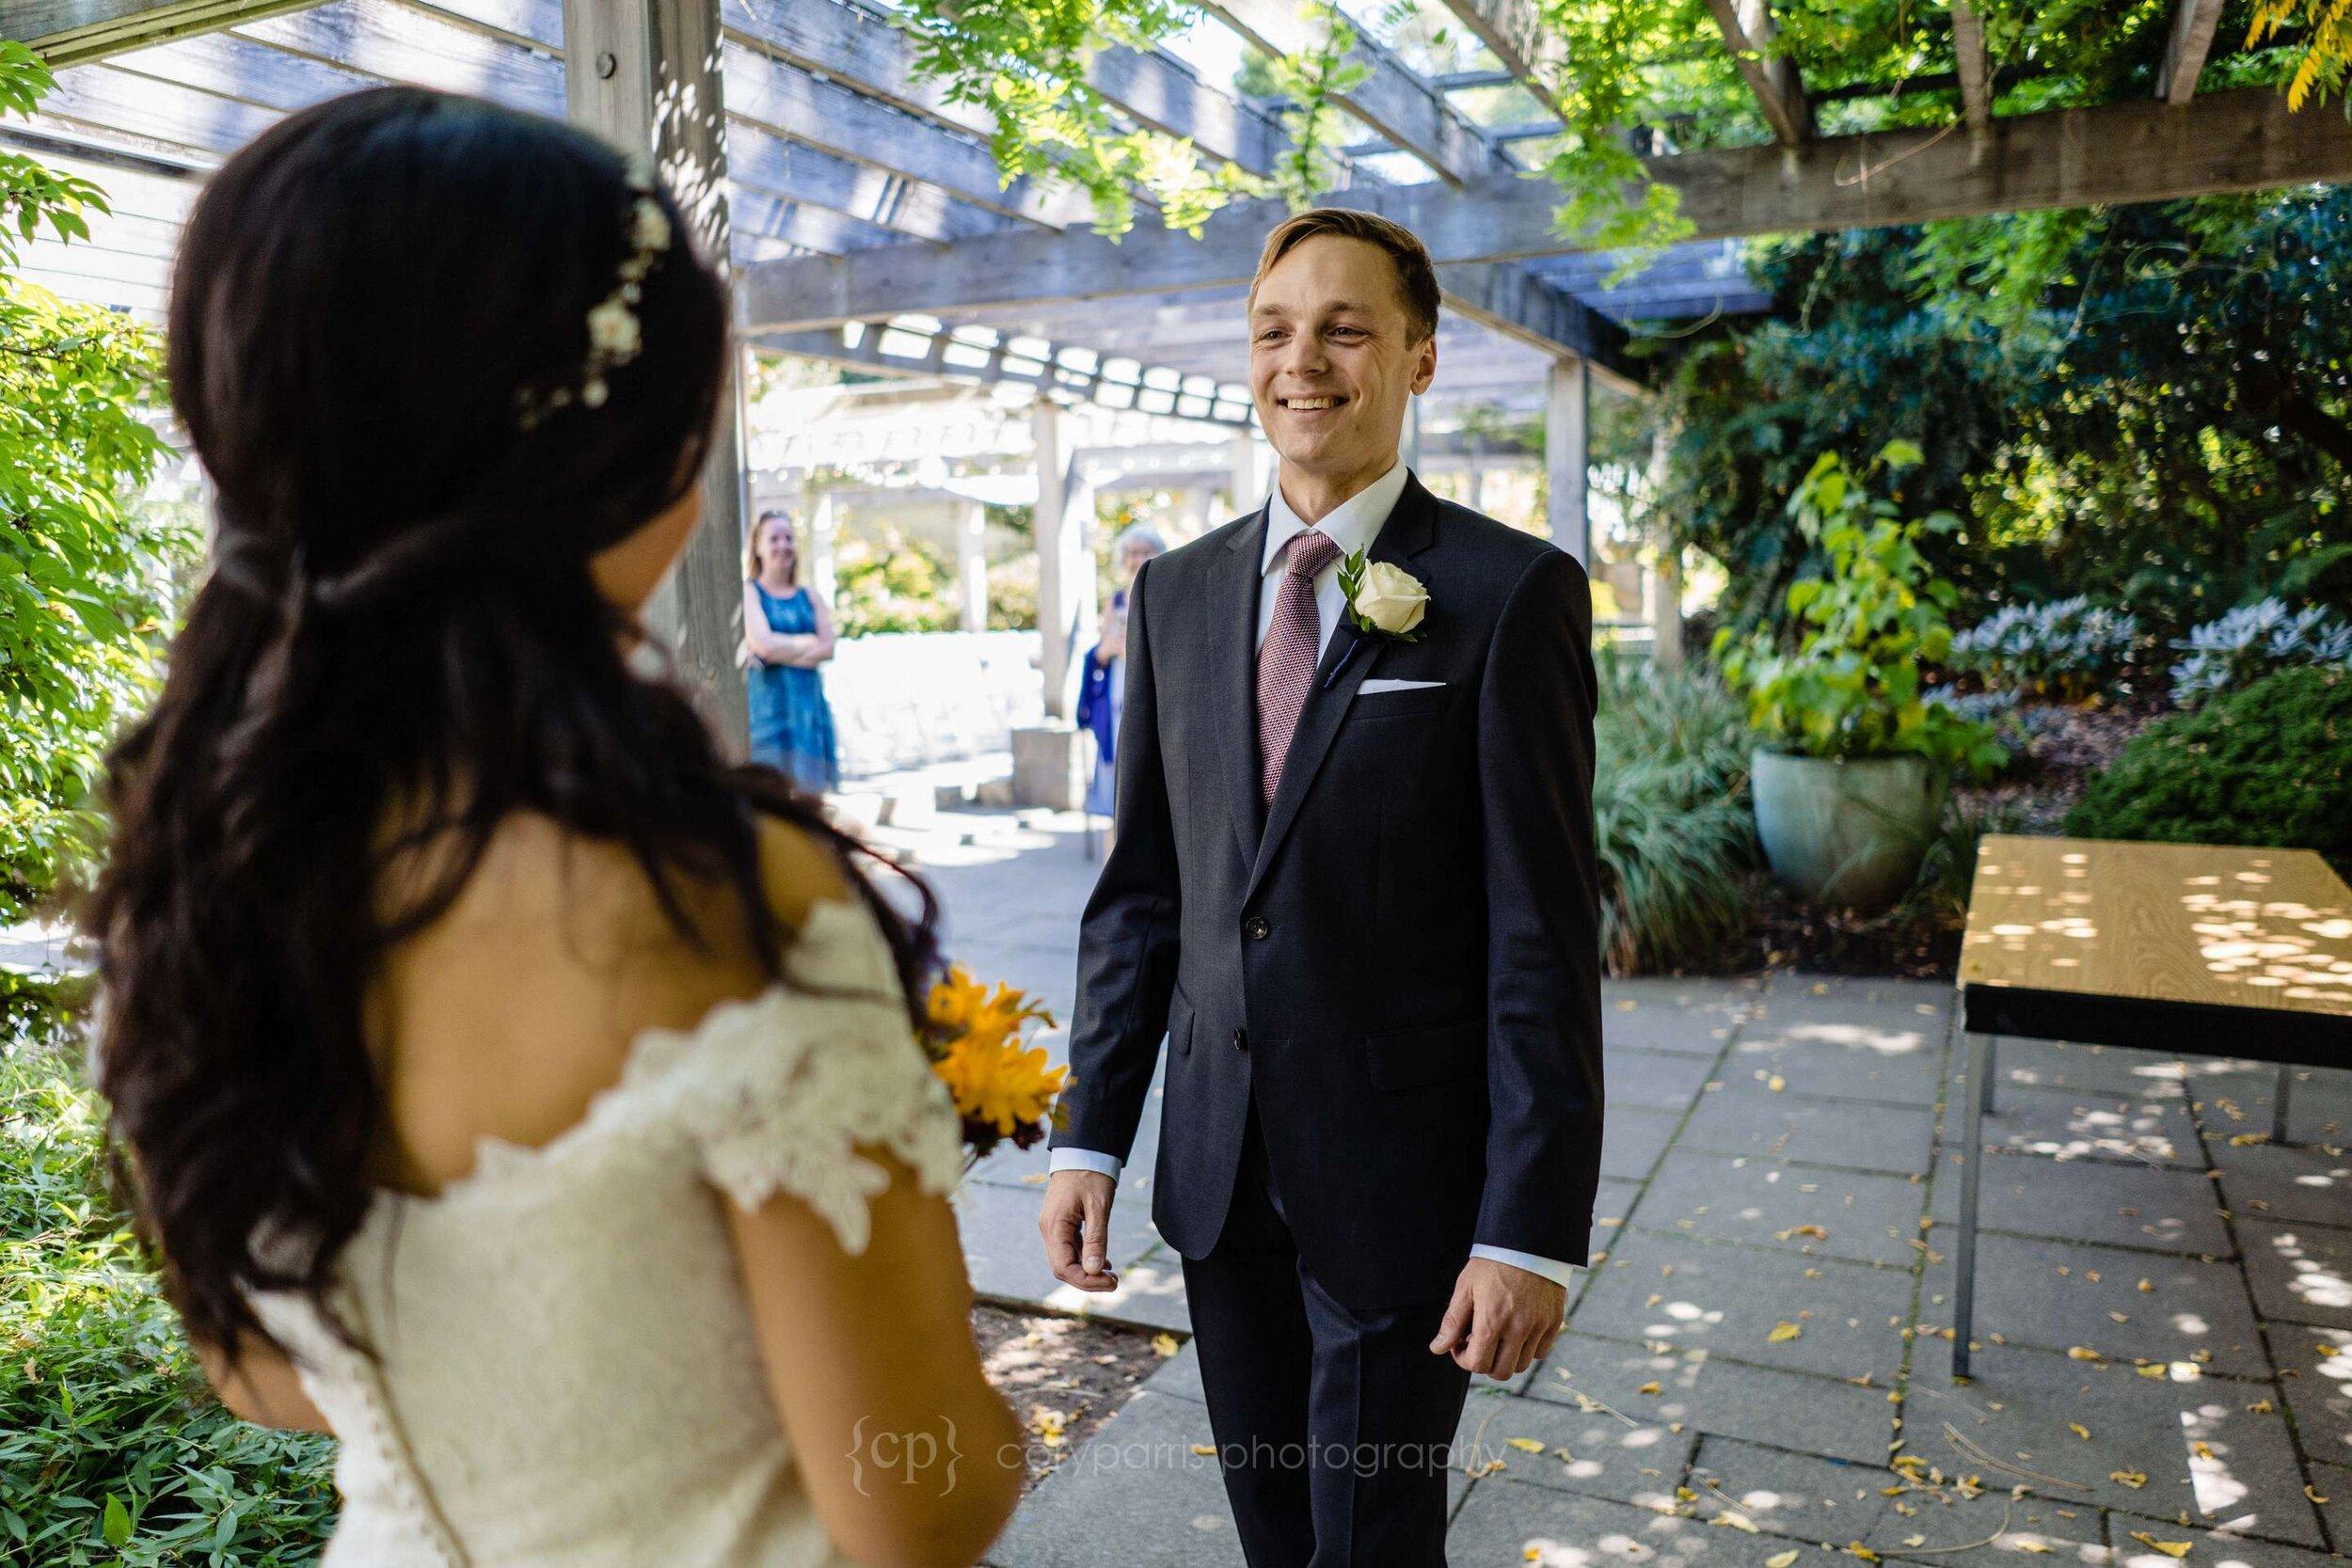 013-washington-park-arboretum-wedding.jpg